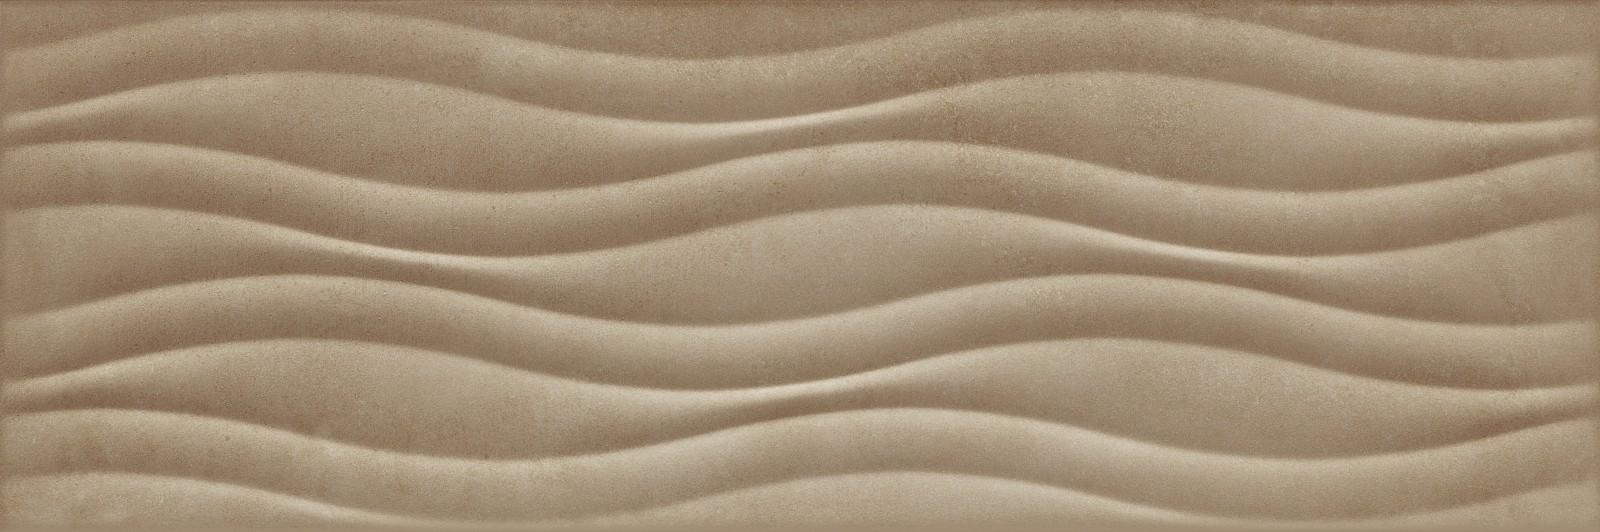 Стенни плочки Clayline Earth Struttura Share 3D 22x66.2